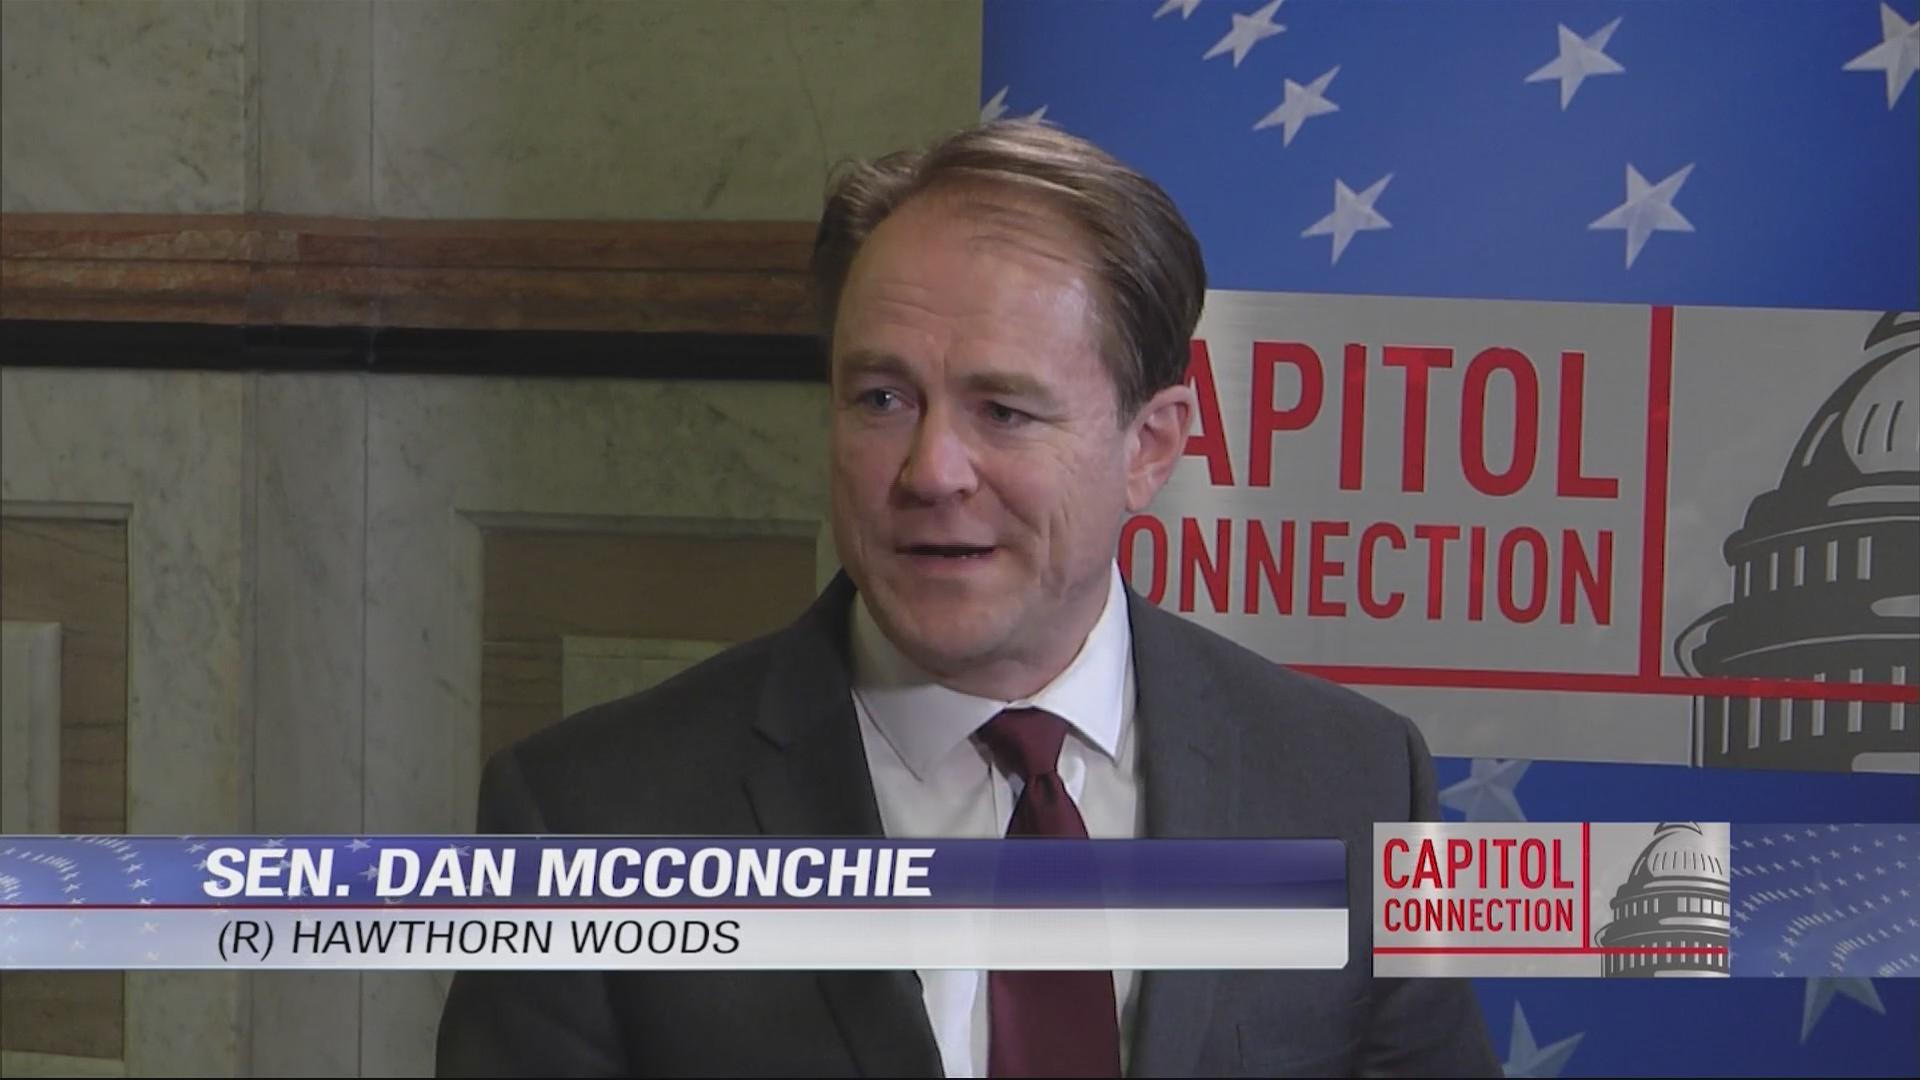 Senator McConchie counters progressive income tax, seeks higher barrier to raise taxes